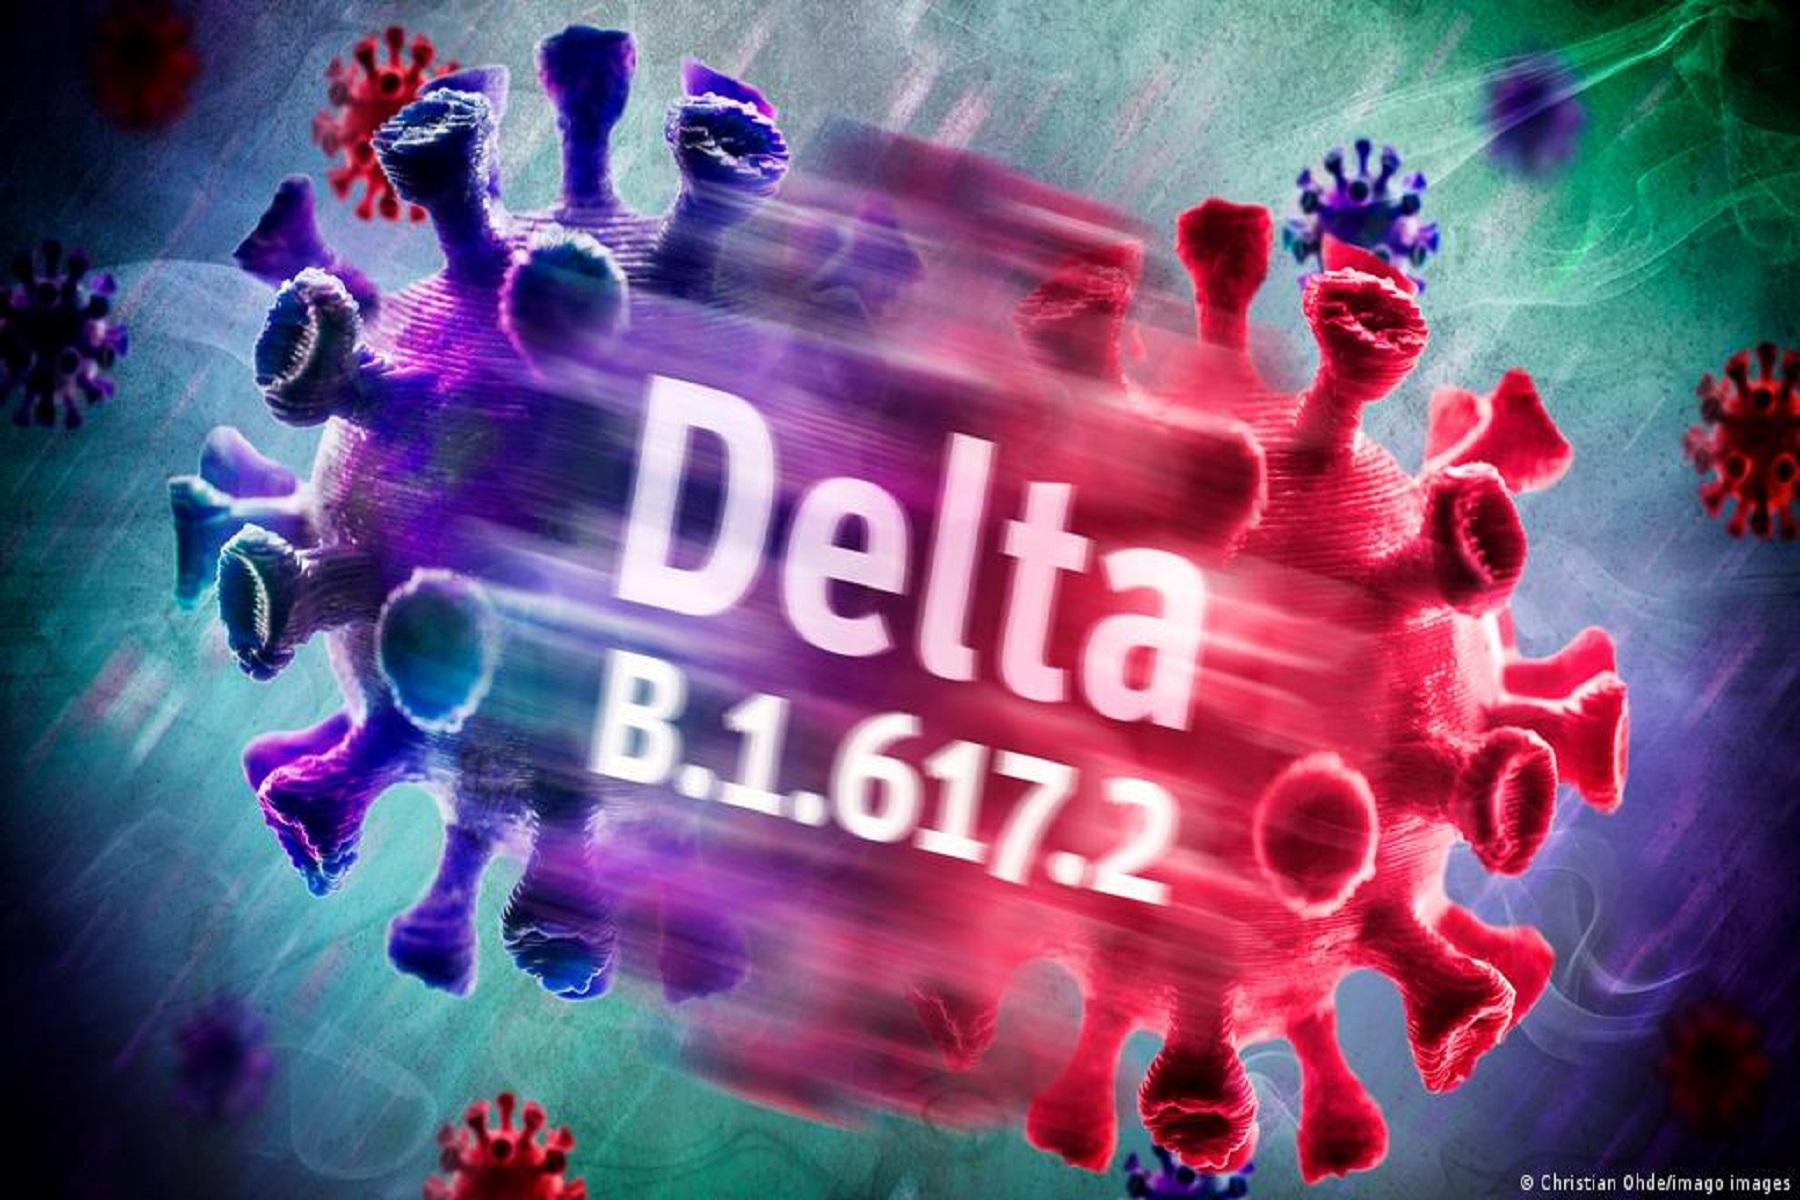 COVID-19: Ποια εμβόλια είναι αποτελεσματικά έναντι της παραλλαγής δέλτα;